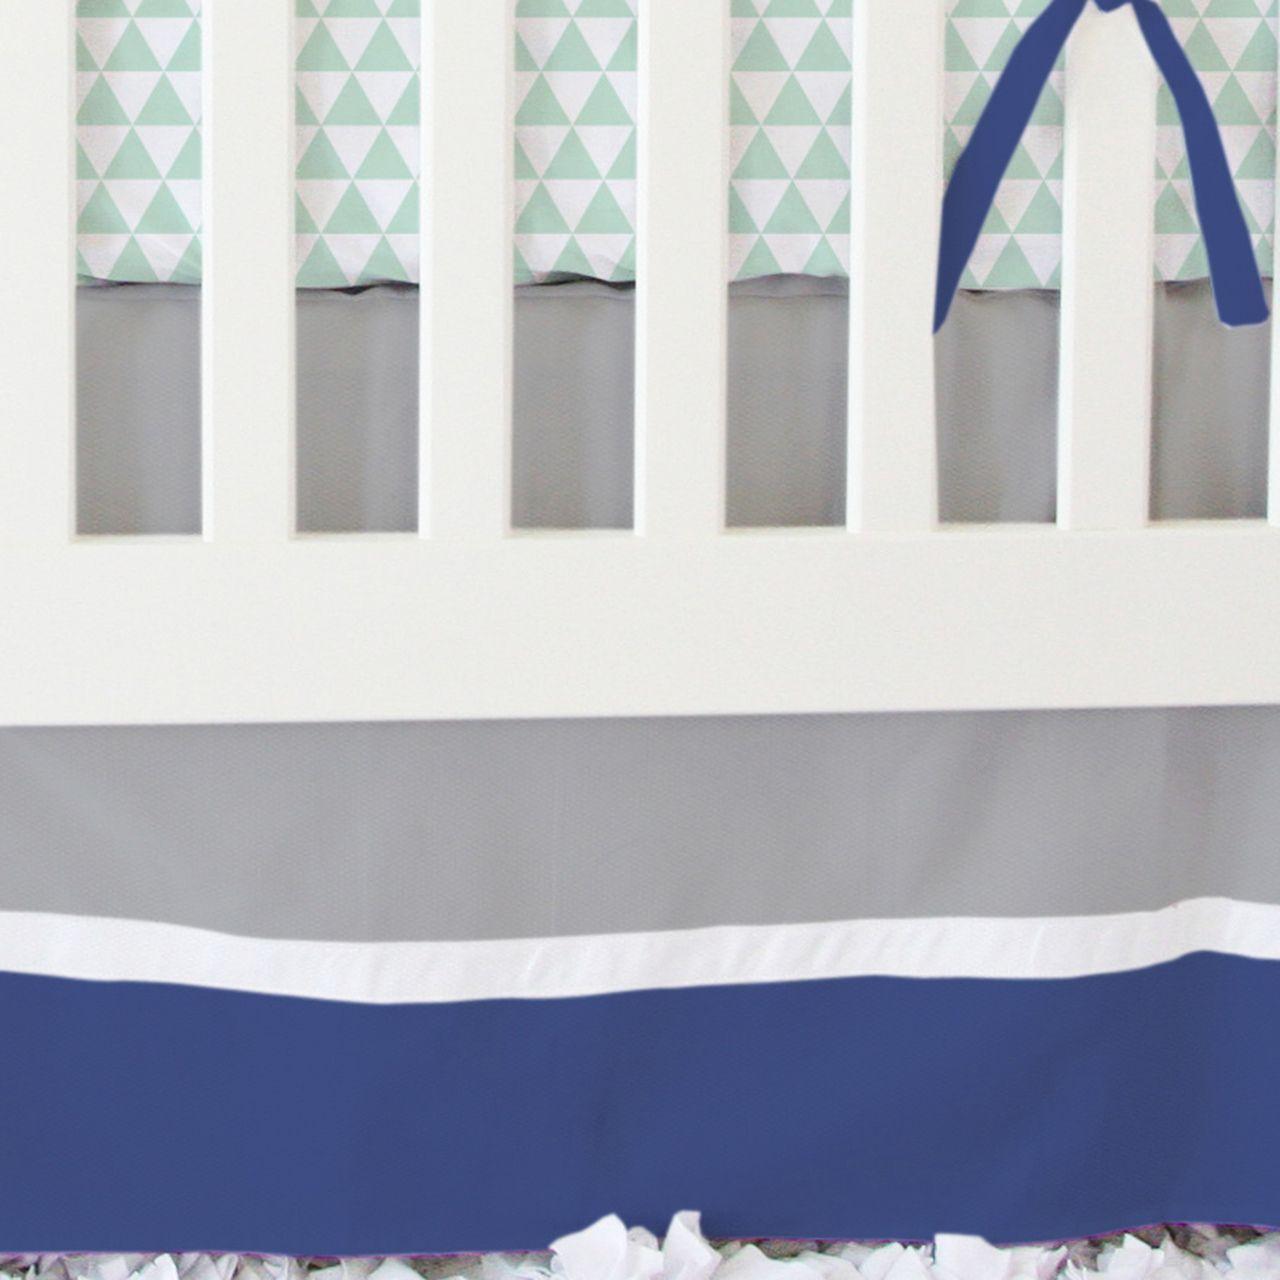 Caden Lane Baby Bedding - Navy and Mint Arrow Bumperless Crib Bedding, $172.00 (http://cadenlane.com/navy-and-mint-arrow-bumperless-crib-bedding/)